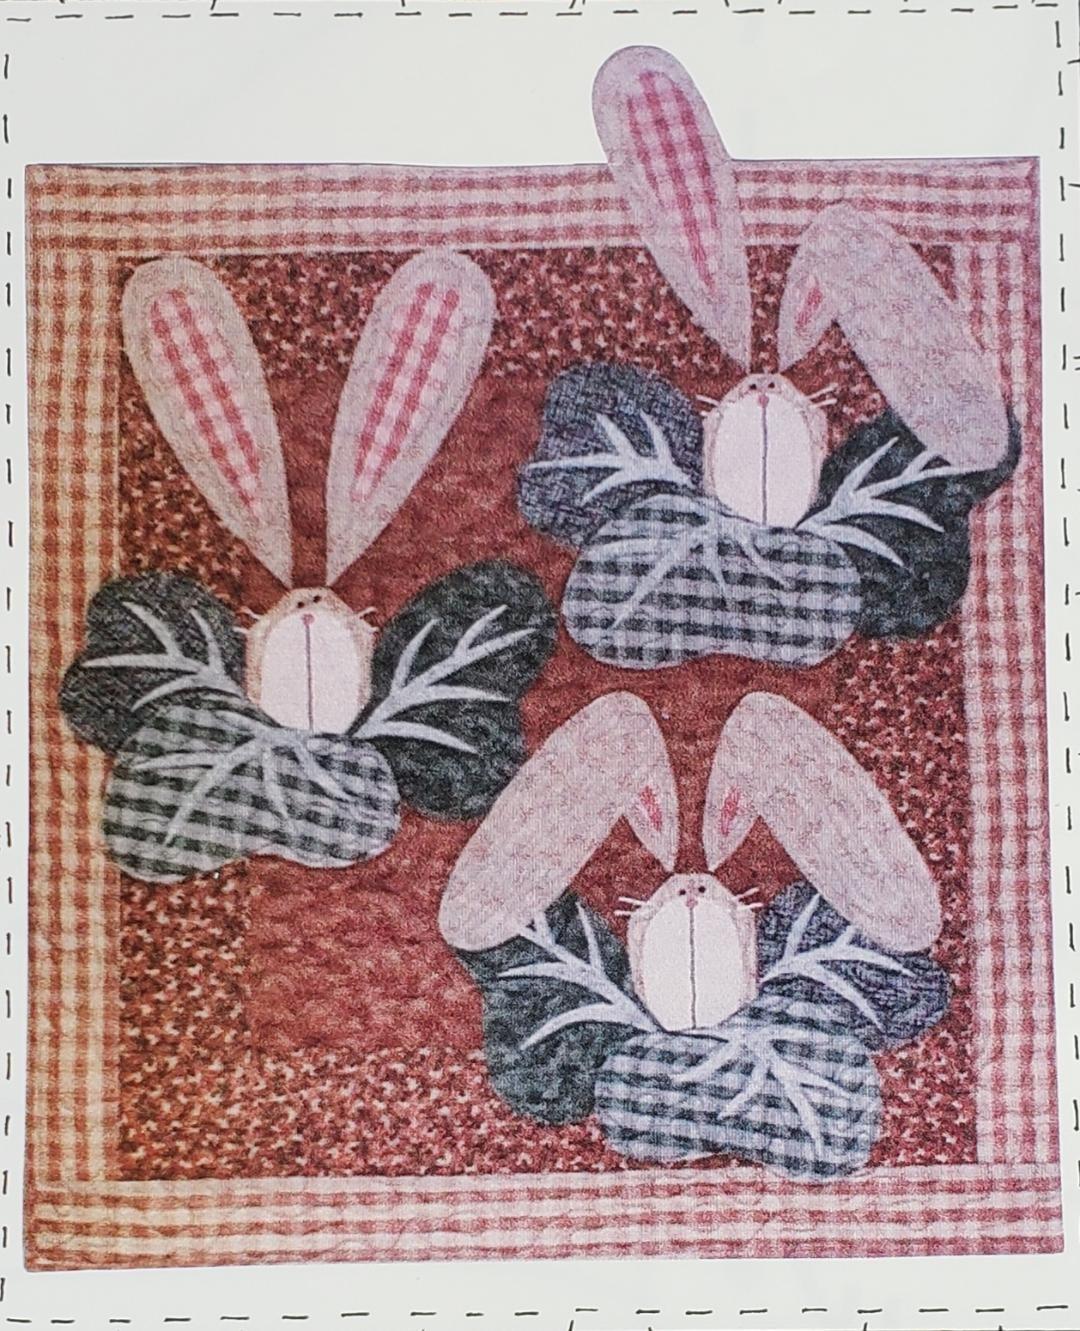 Hare Raising Experience #349